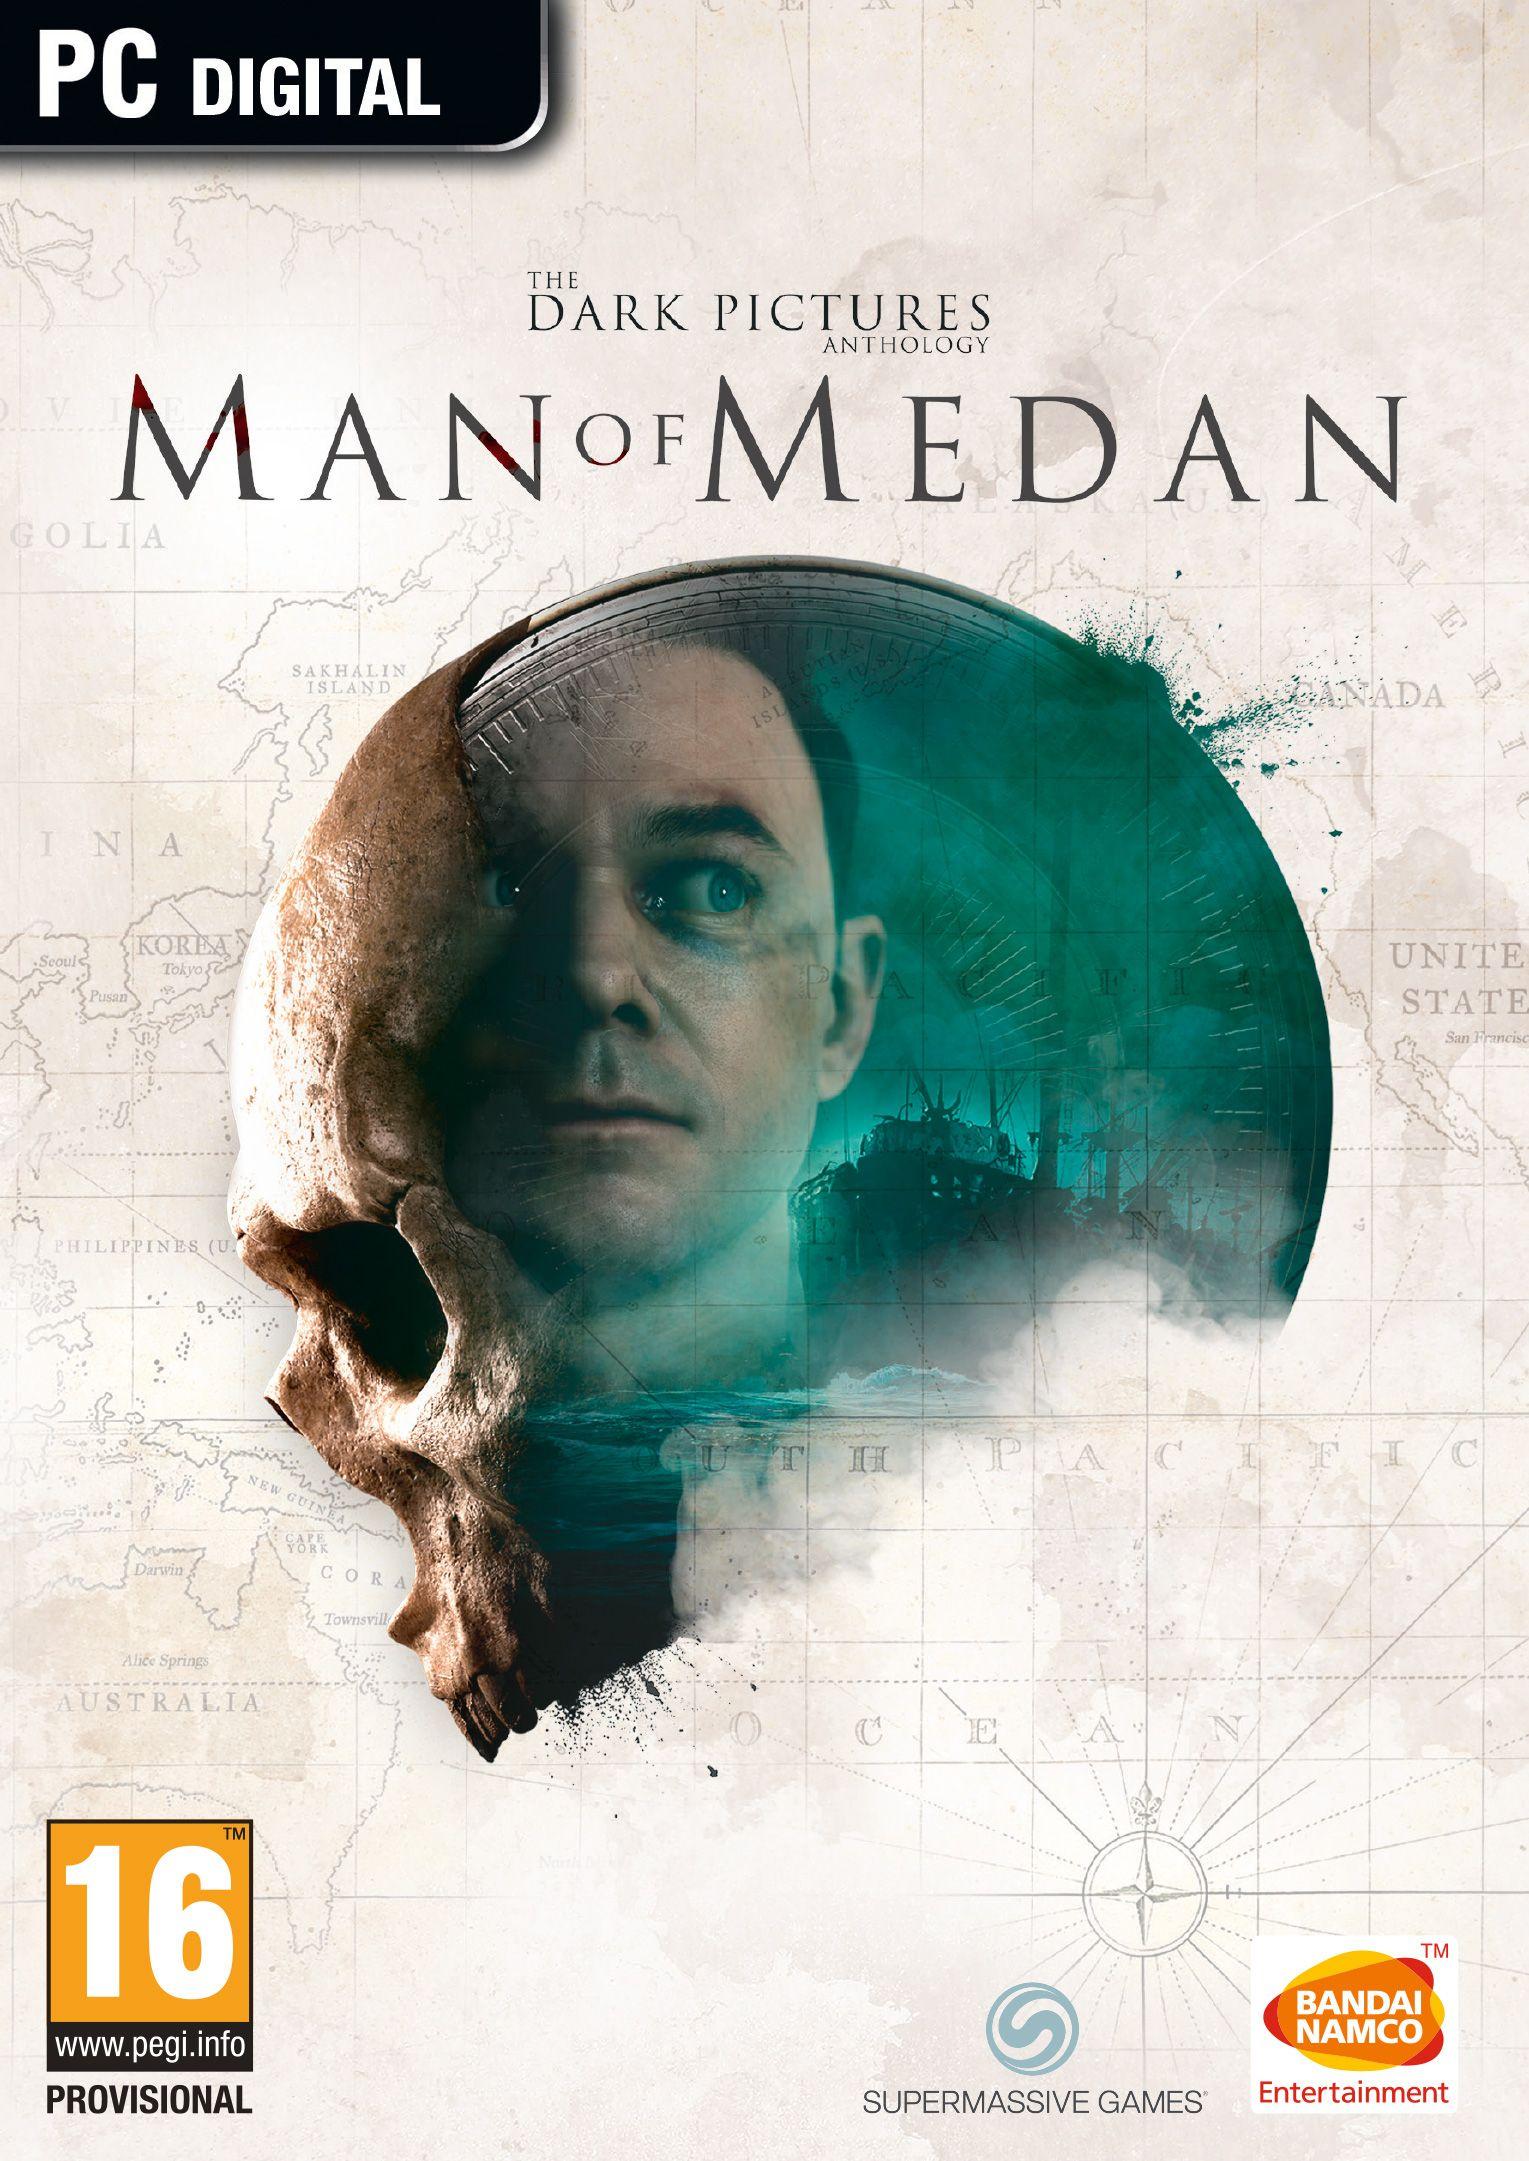 [Steam] The Dark Pictures Anthology: Man of Medan (PC) - £8.25 @ Gamersgate